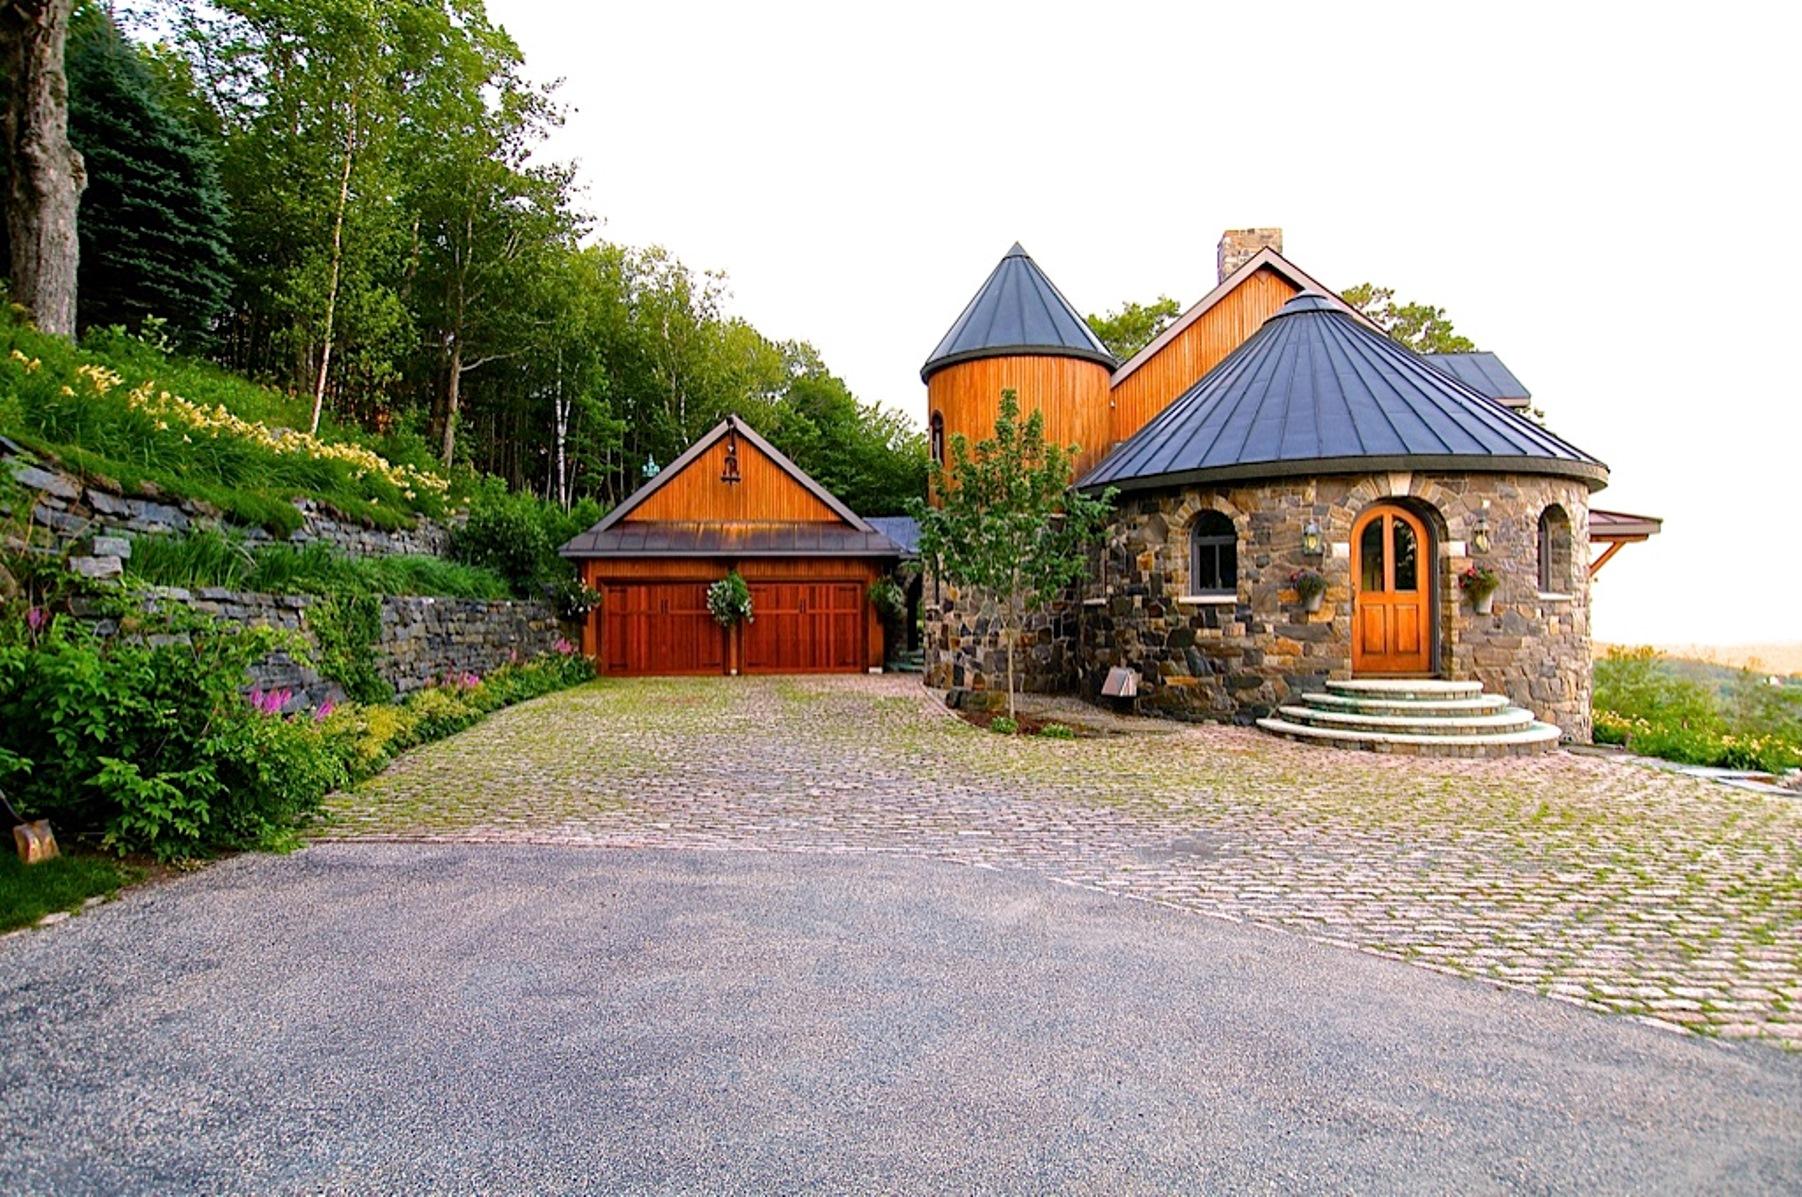 獨棟家庭住宅 為 出售 在 44 Beacon Hill Rd, Strafford Strafford, 佛蒙特州, 05072 美國